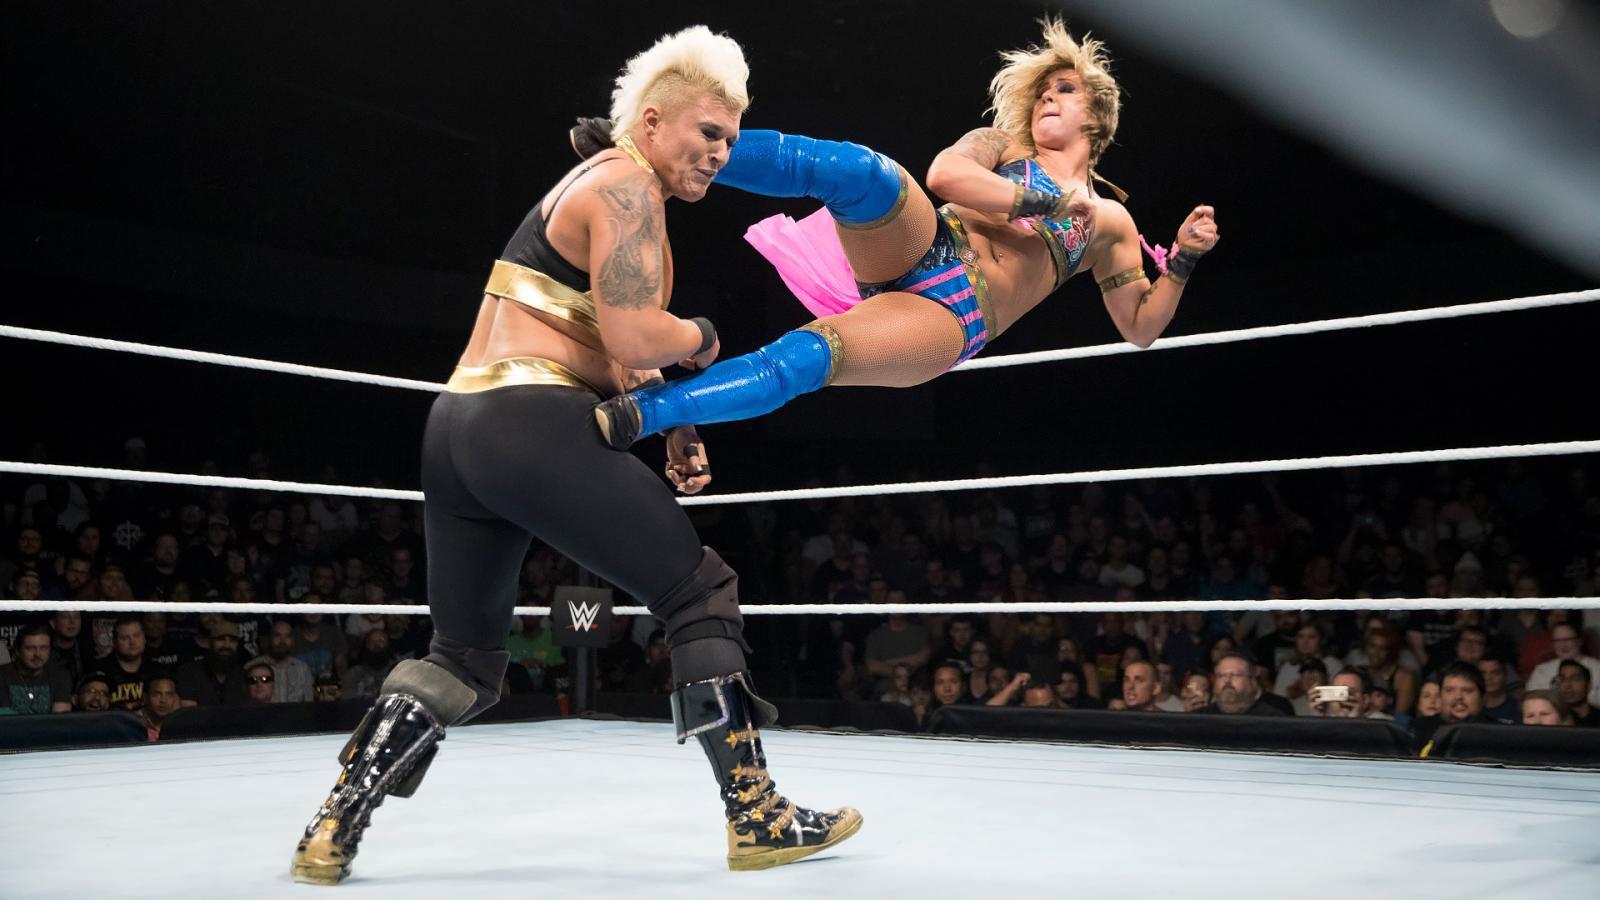 Weltmeisterin Wrestling